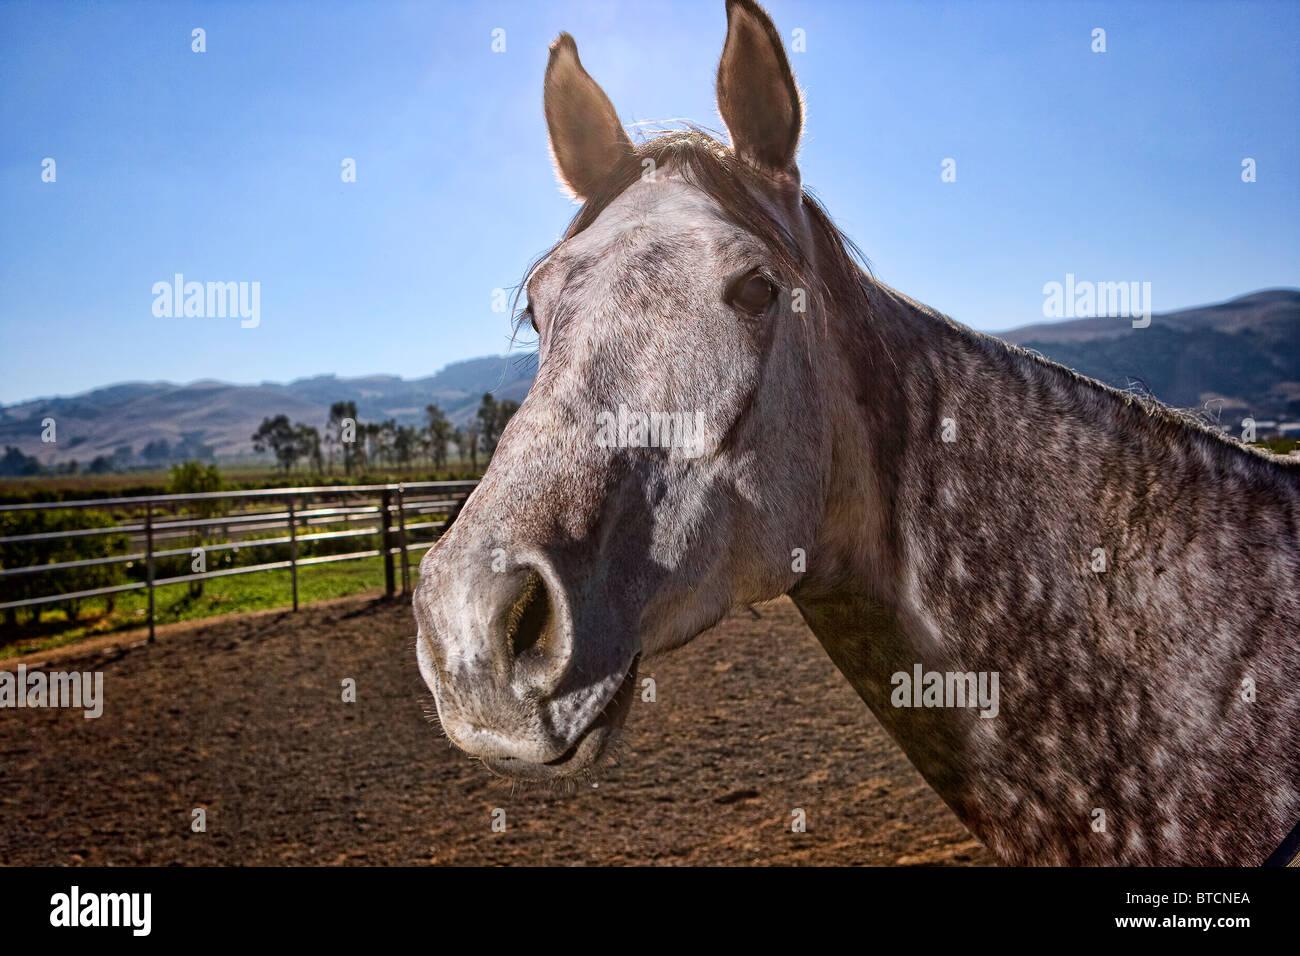 A grey horse head shot - Stock Image